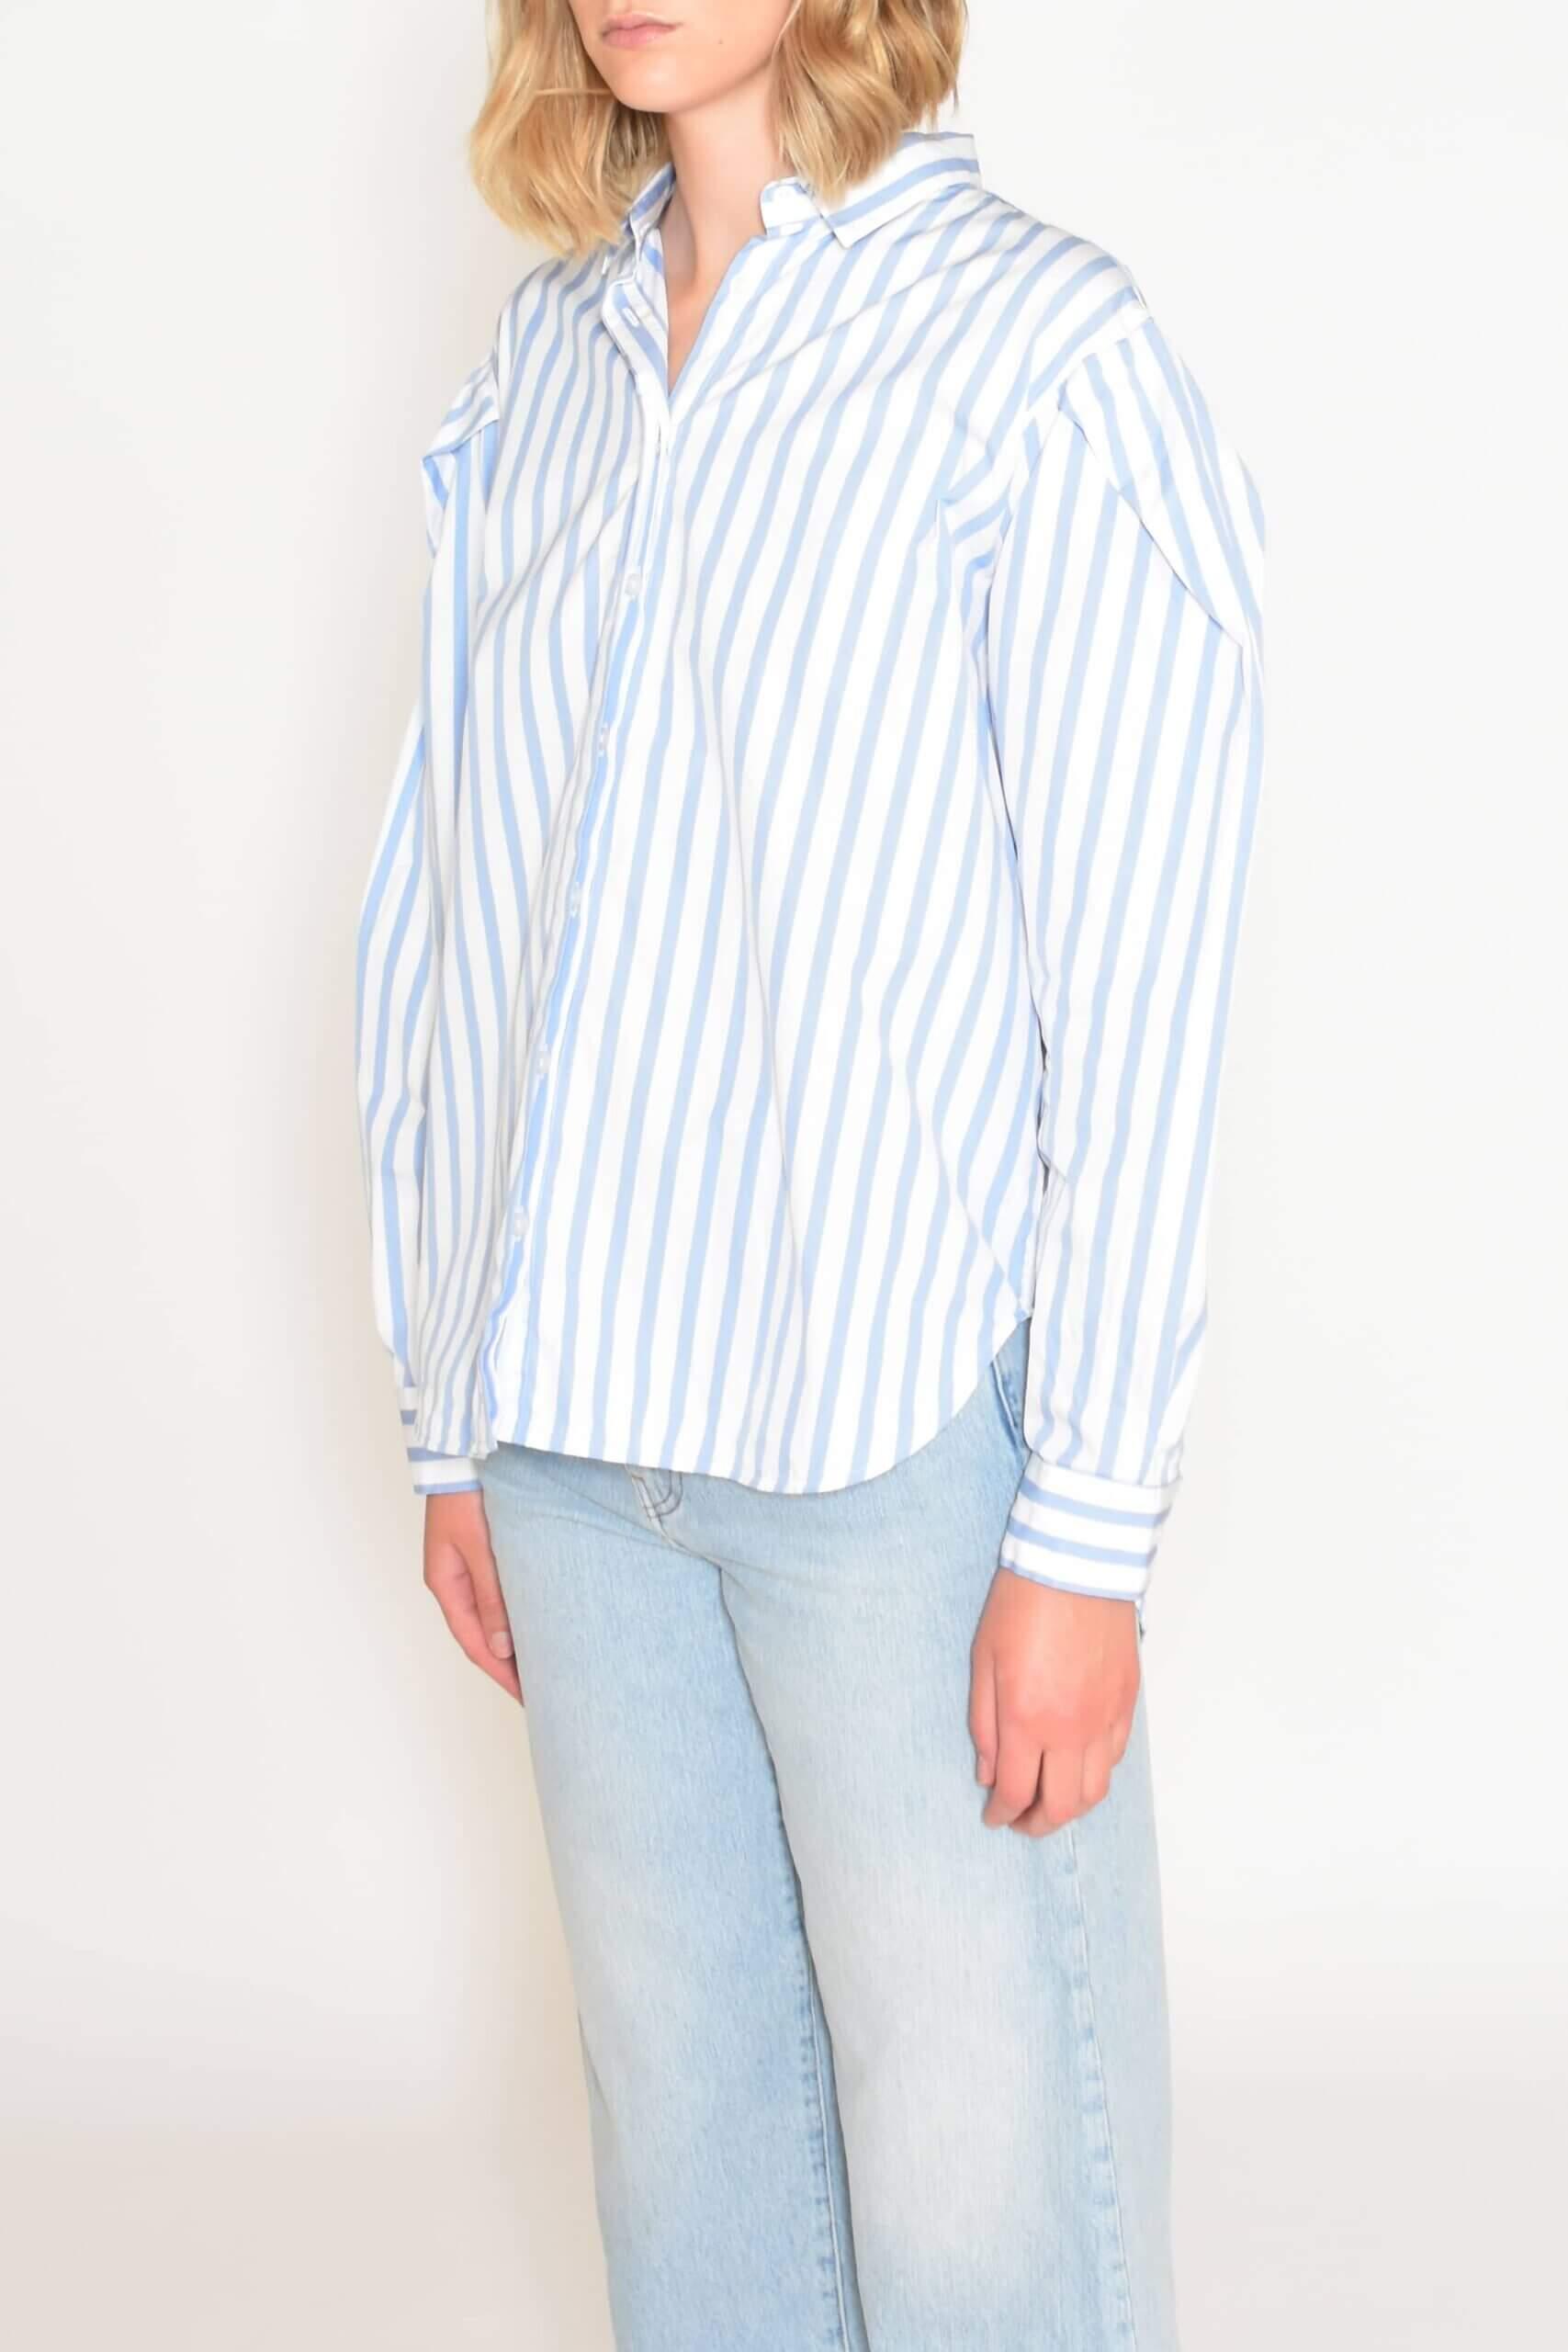 Priola Shirt